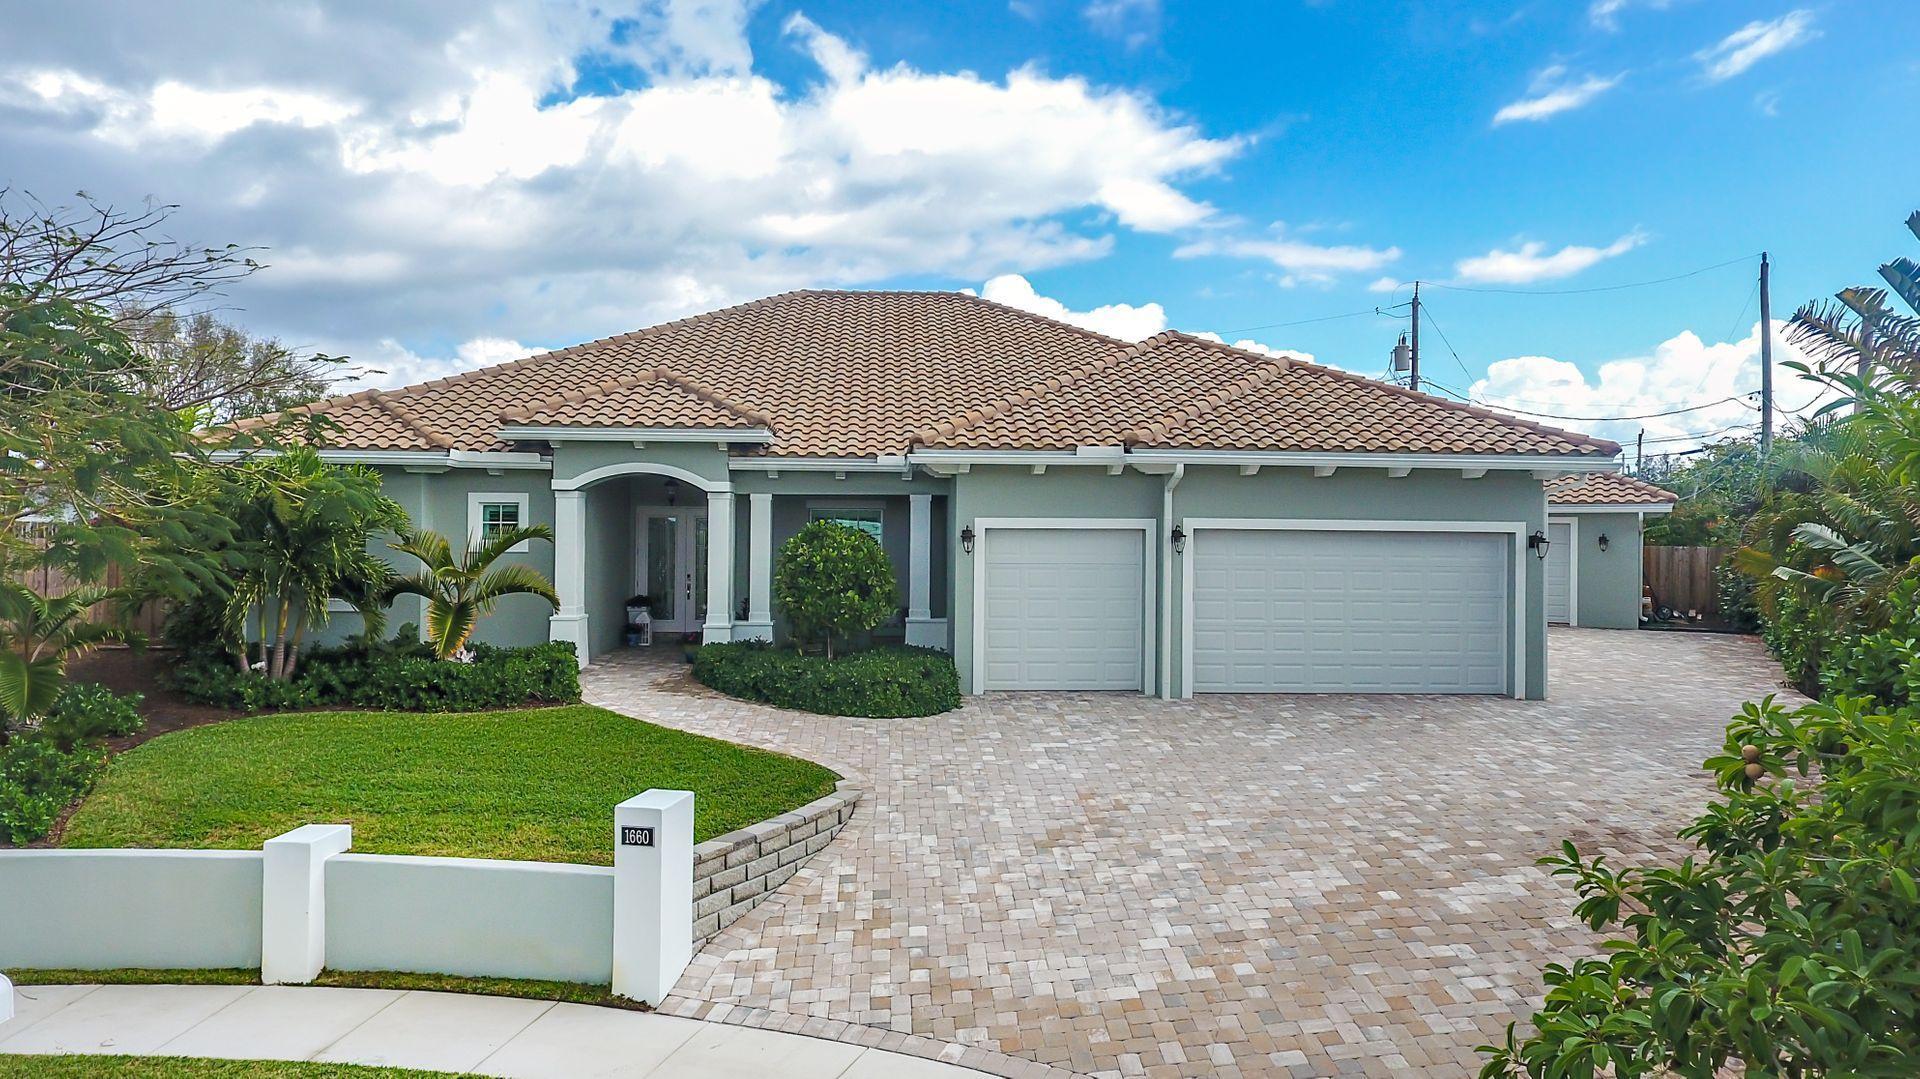 1660 Isles Circle, Juno Beach, Florida 33408, 4 Bedrooms Bedrooms, ,2.1 BathroomsBathrooms,Single Family,For Sale,Juno Isles,Isles,RX-10499329